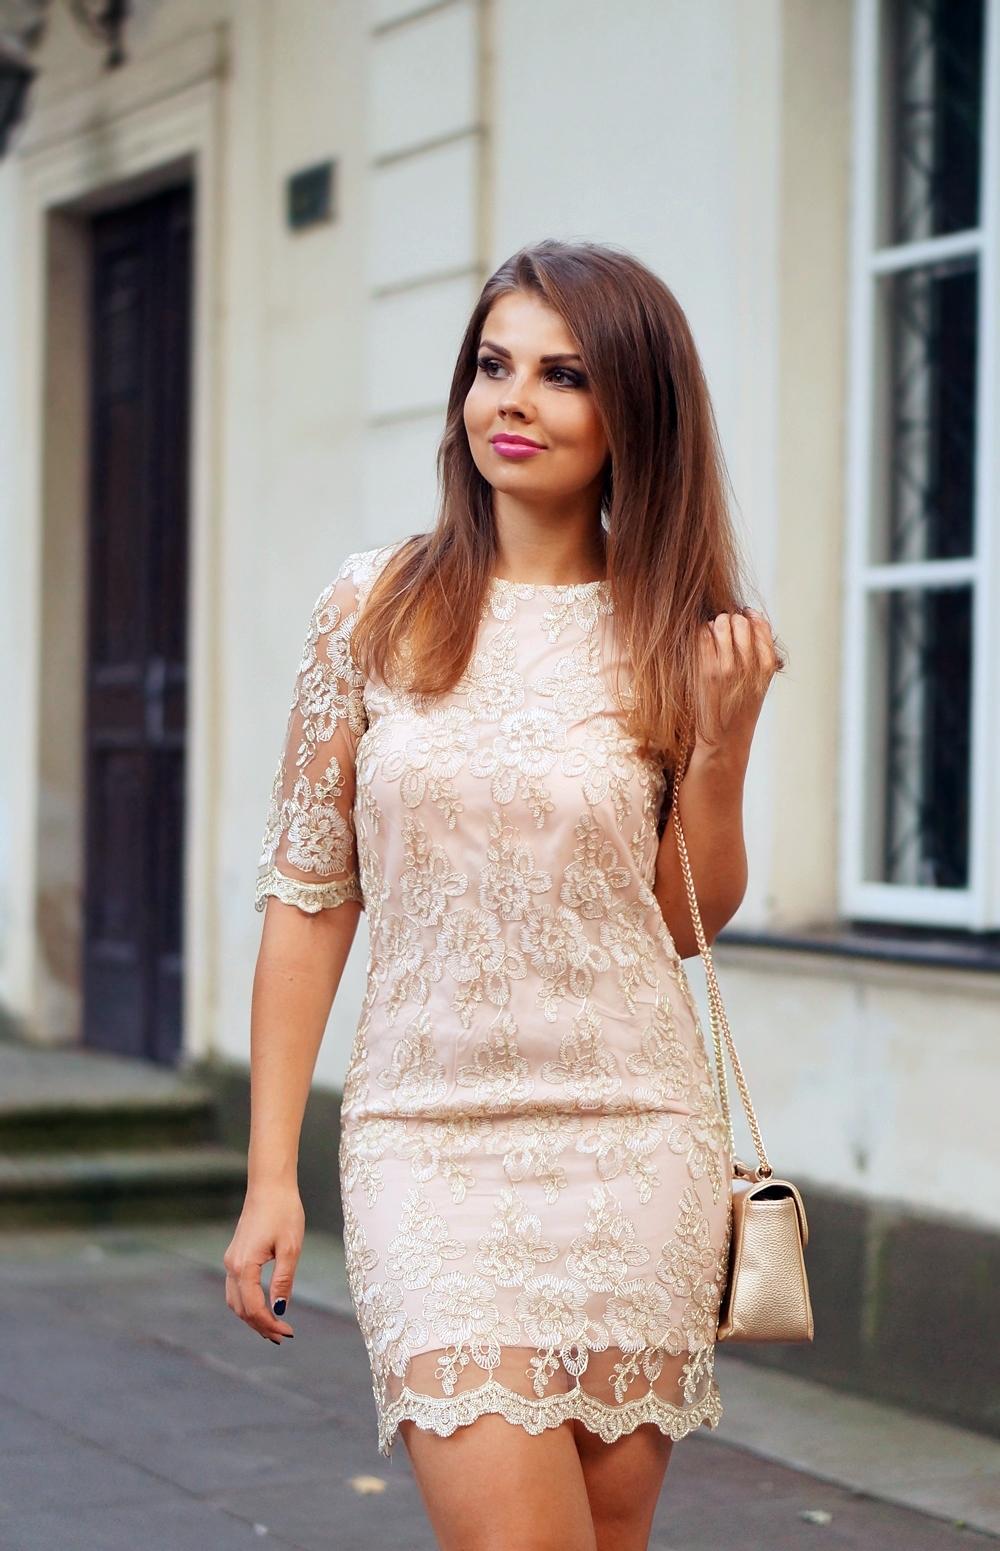 Nude Lace Dress Koronkowa Sukienka W Stylizacji Na Wesele A